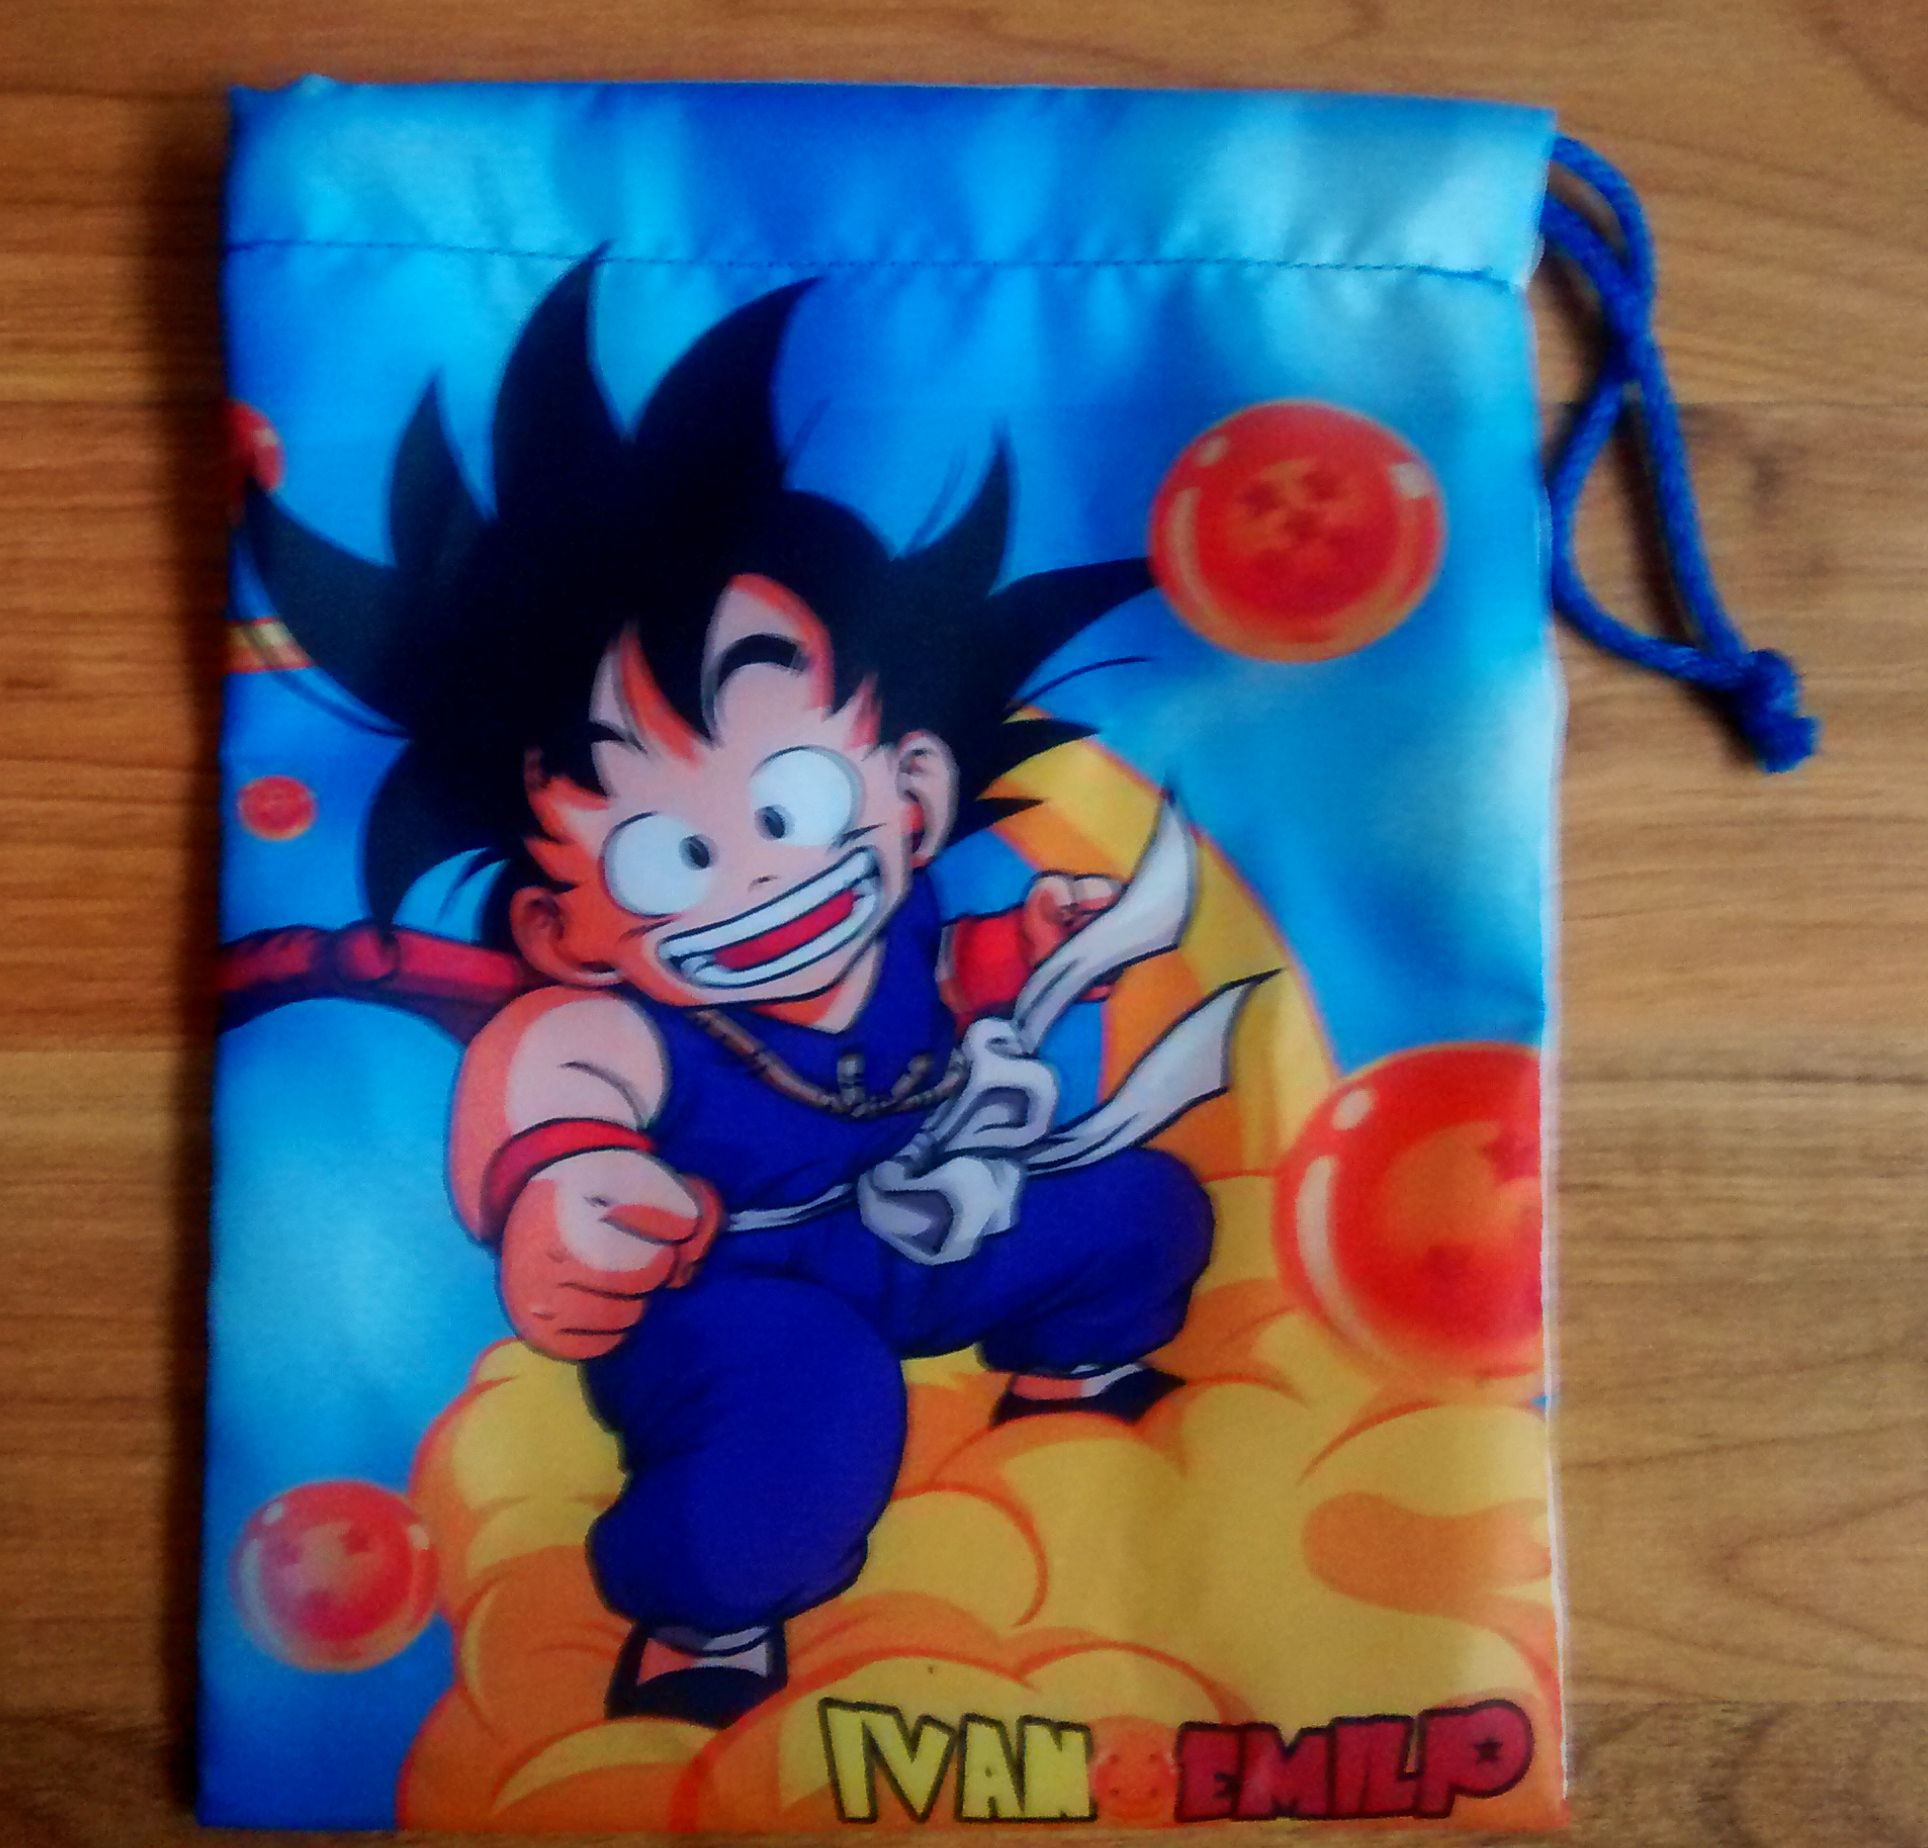 Bolsita Personalizada Para Dulces Dragon Ball Goku Nube 20 X 25 Cm Contacto Facebook Wambi Crafts Dragon Ball Z Dragon Ball Goku Dragon Ball